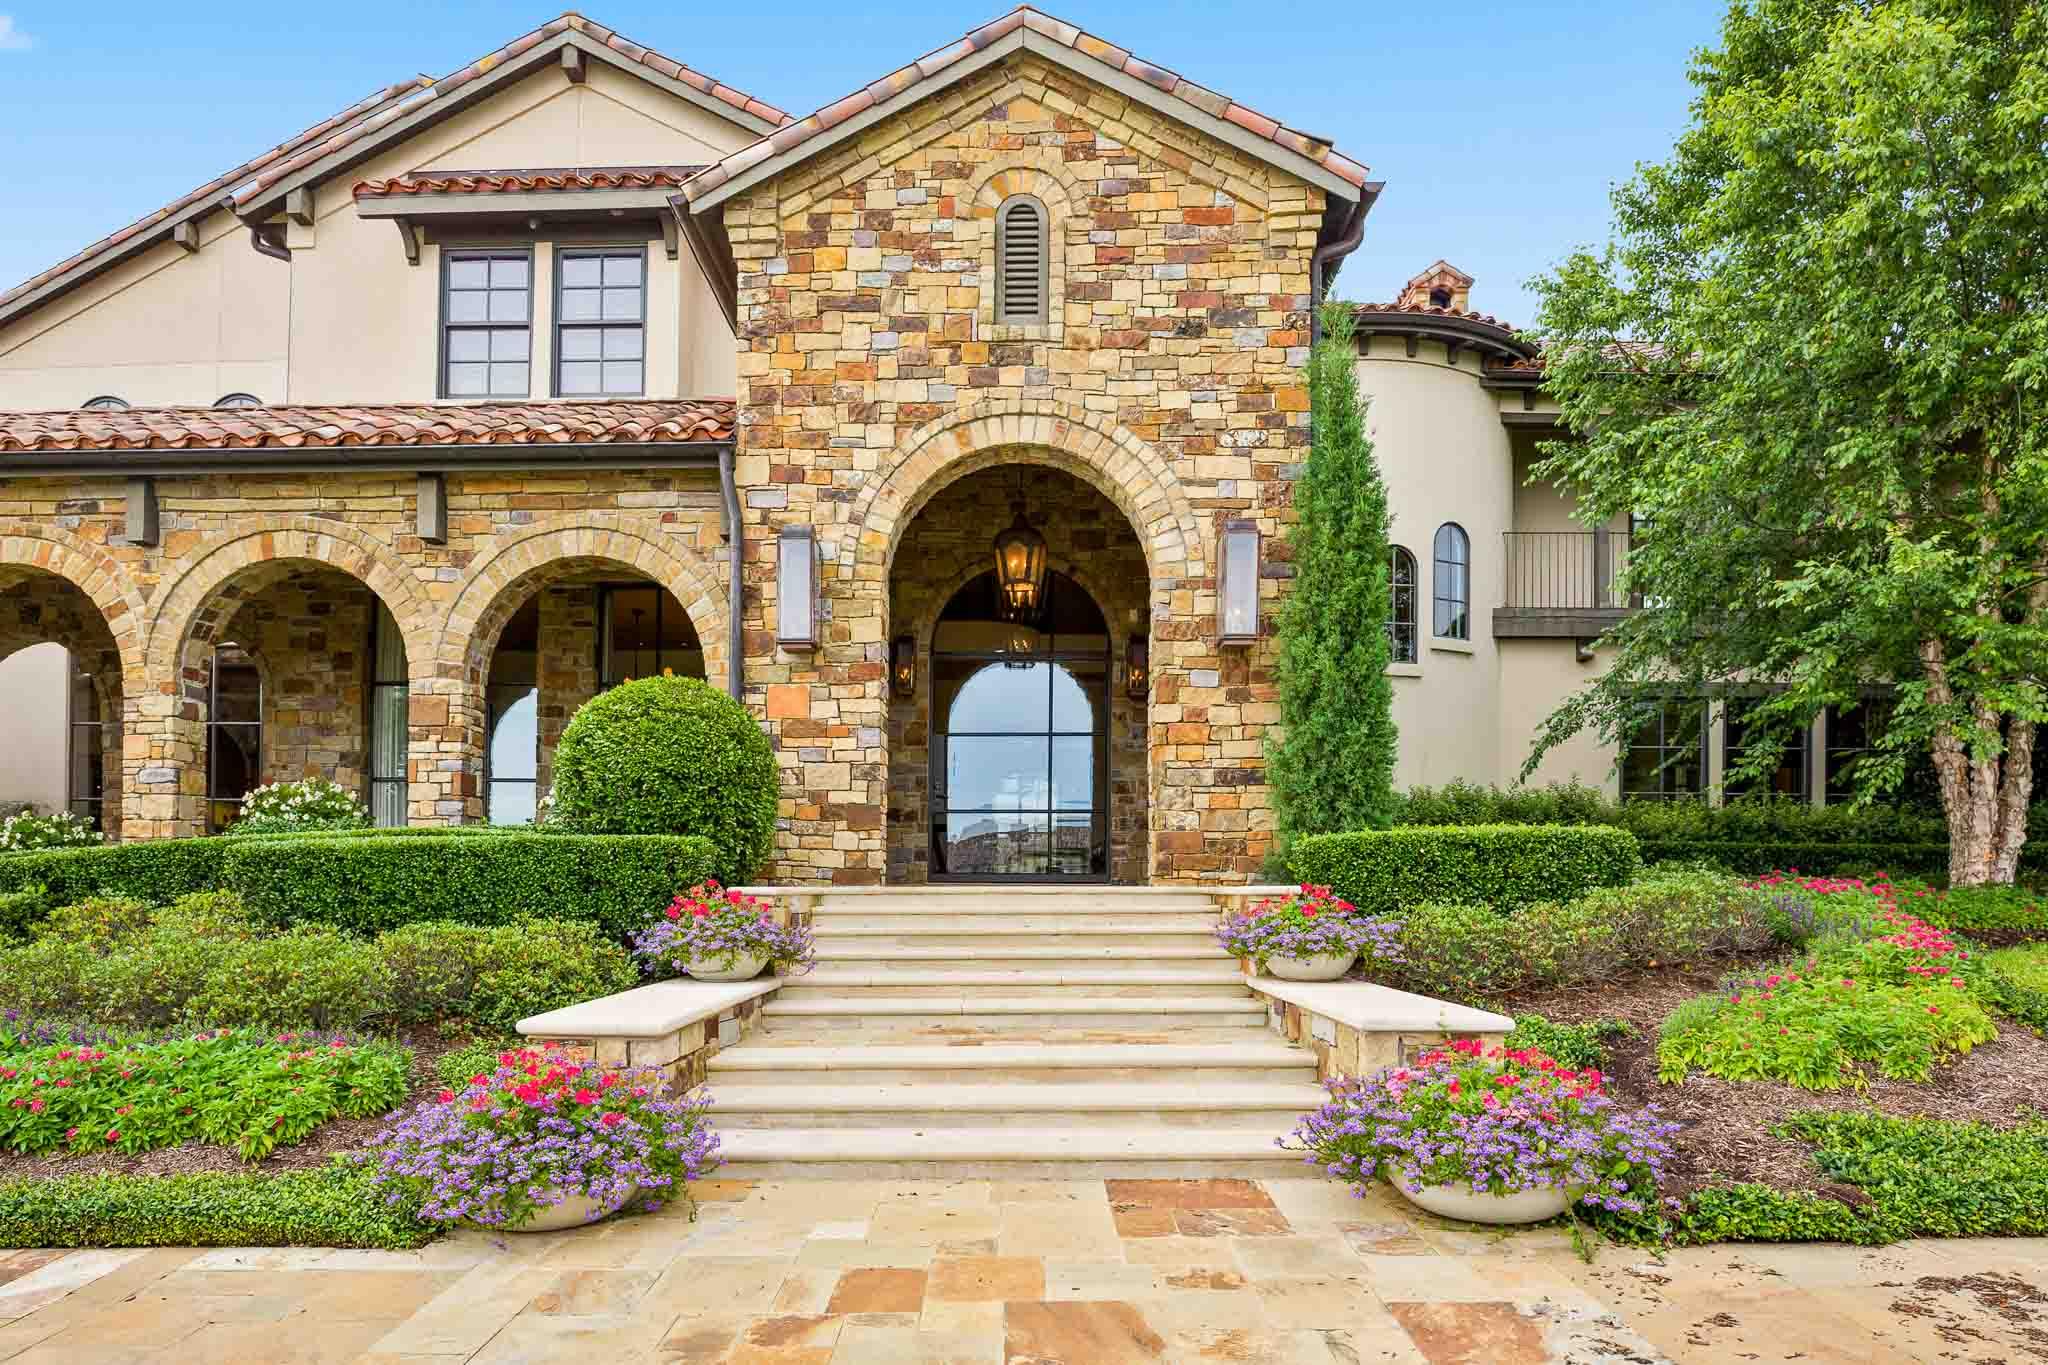 Million dollar estate near Flower Mound listed for sale